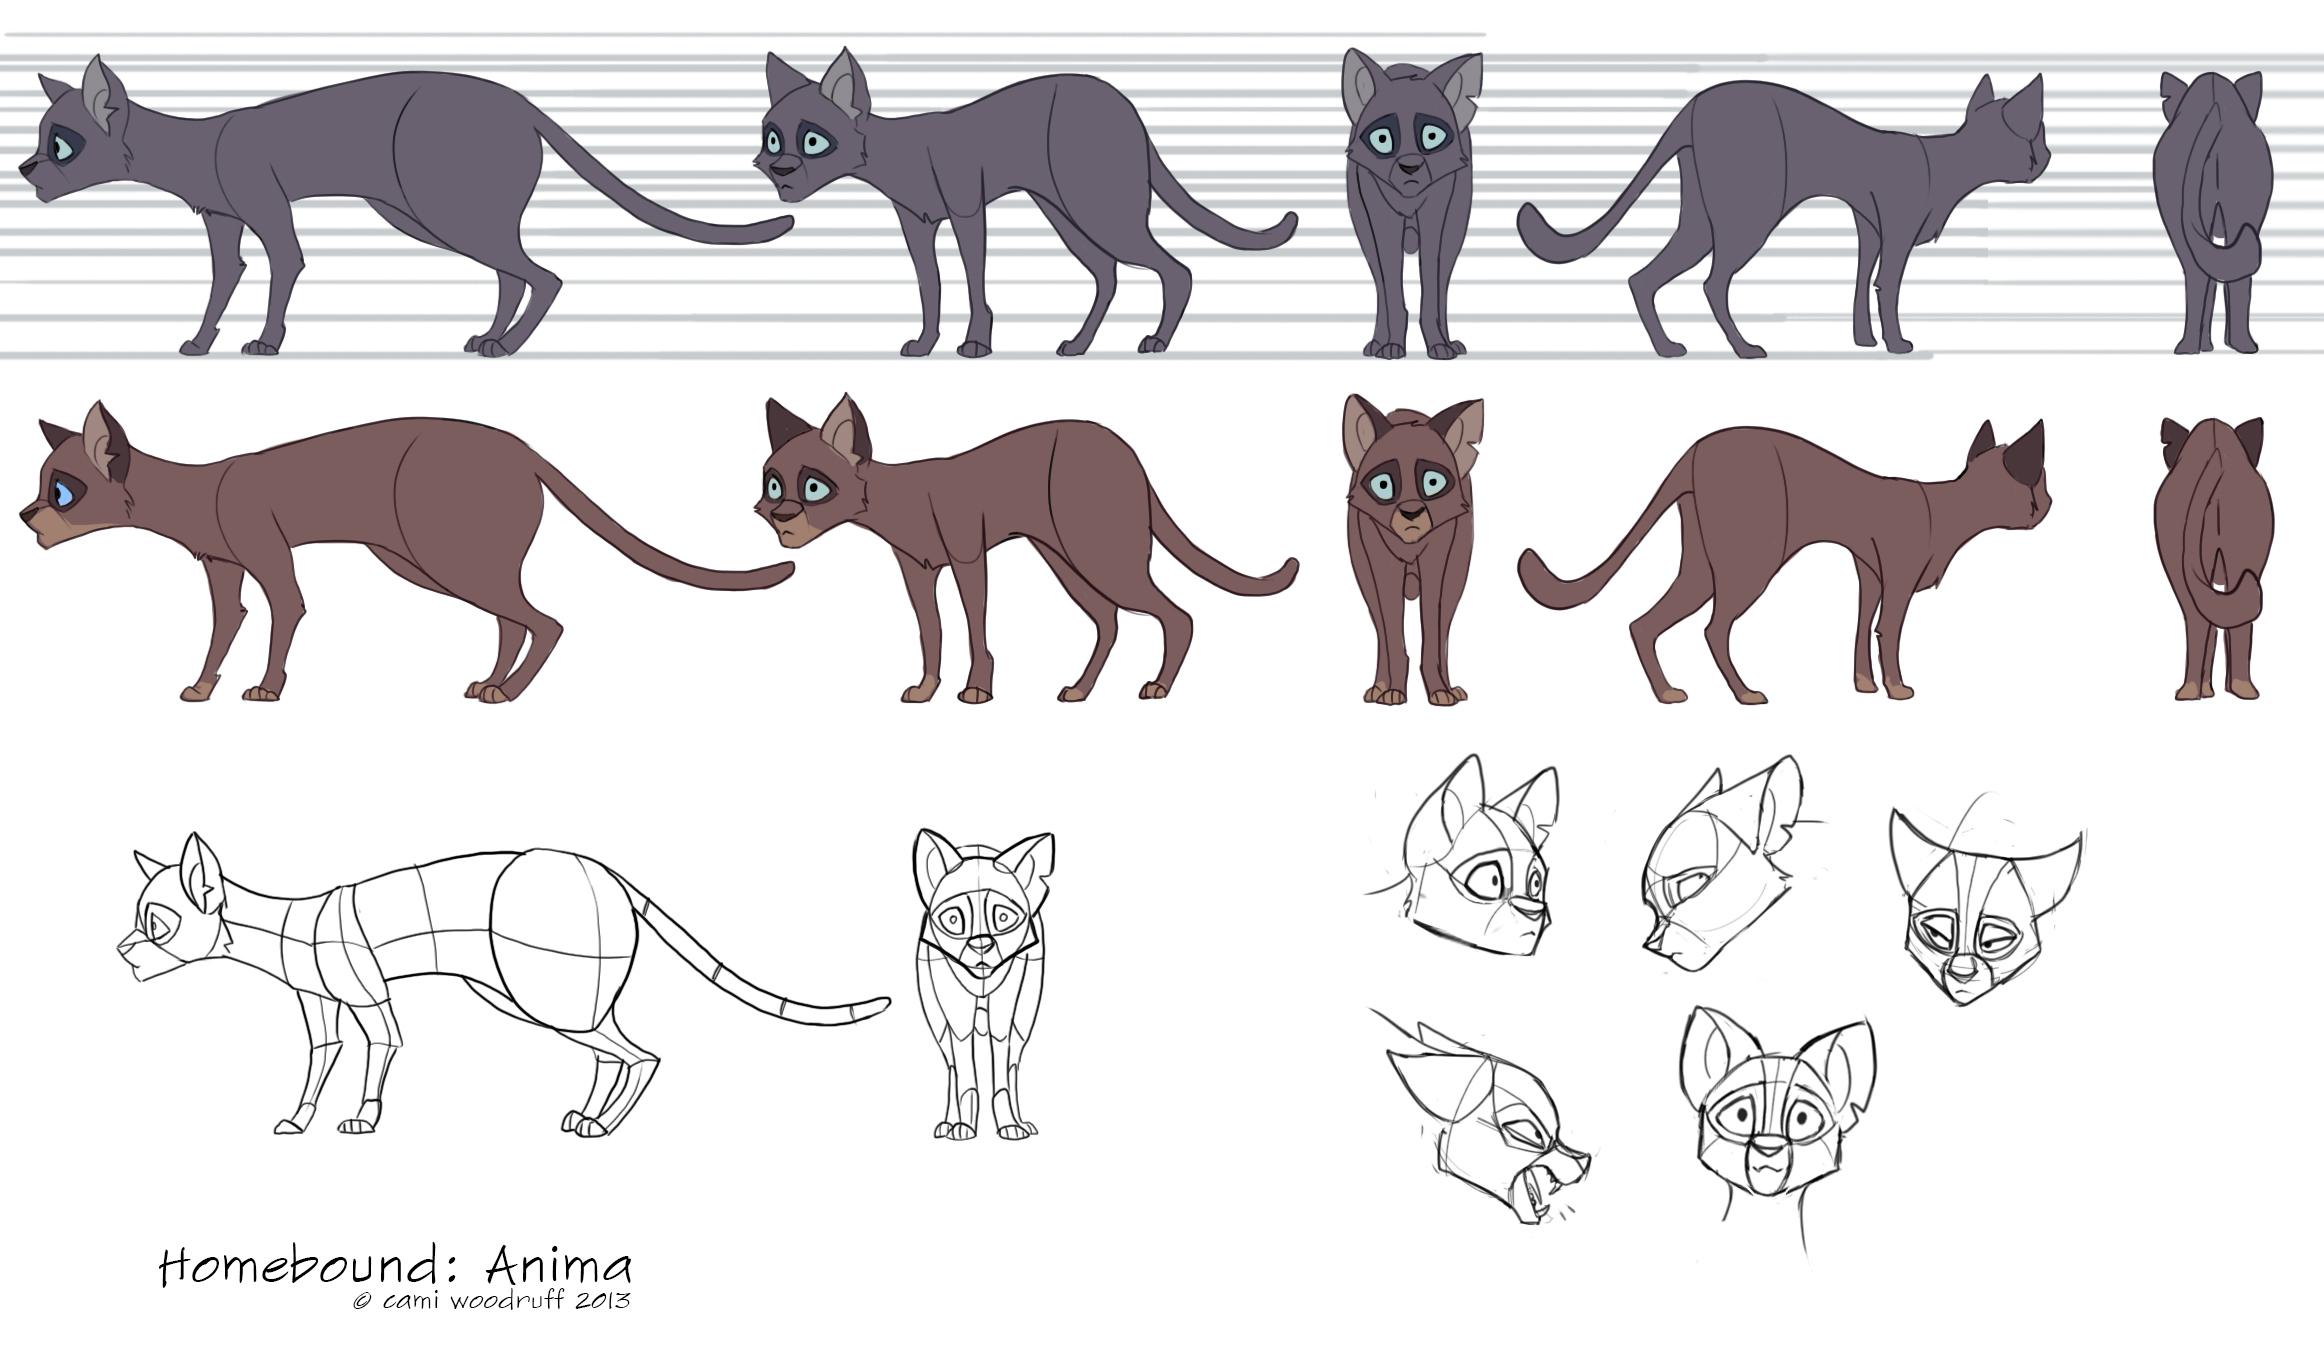 Anima model sheet